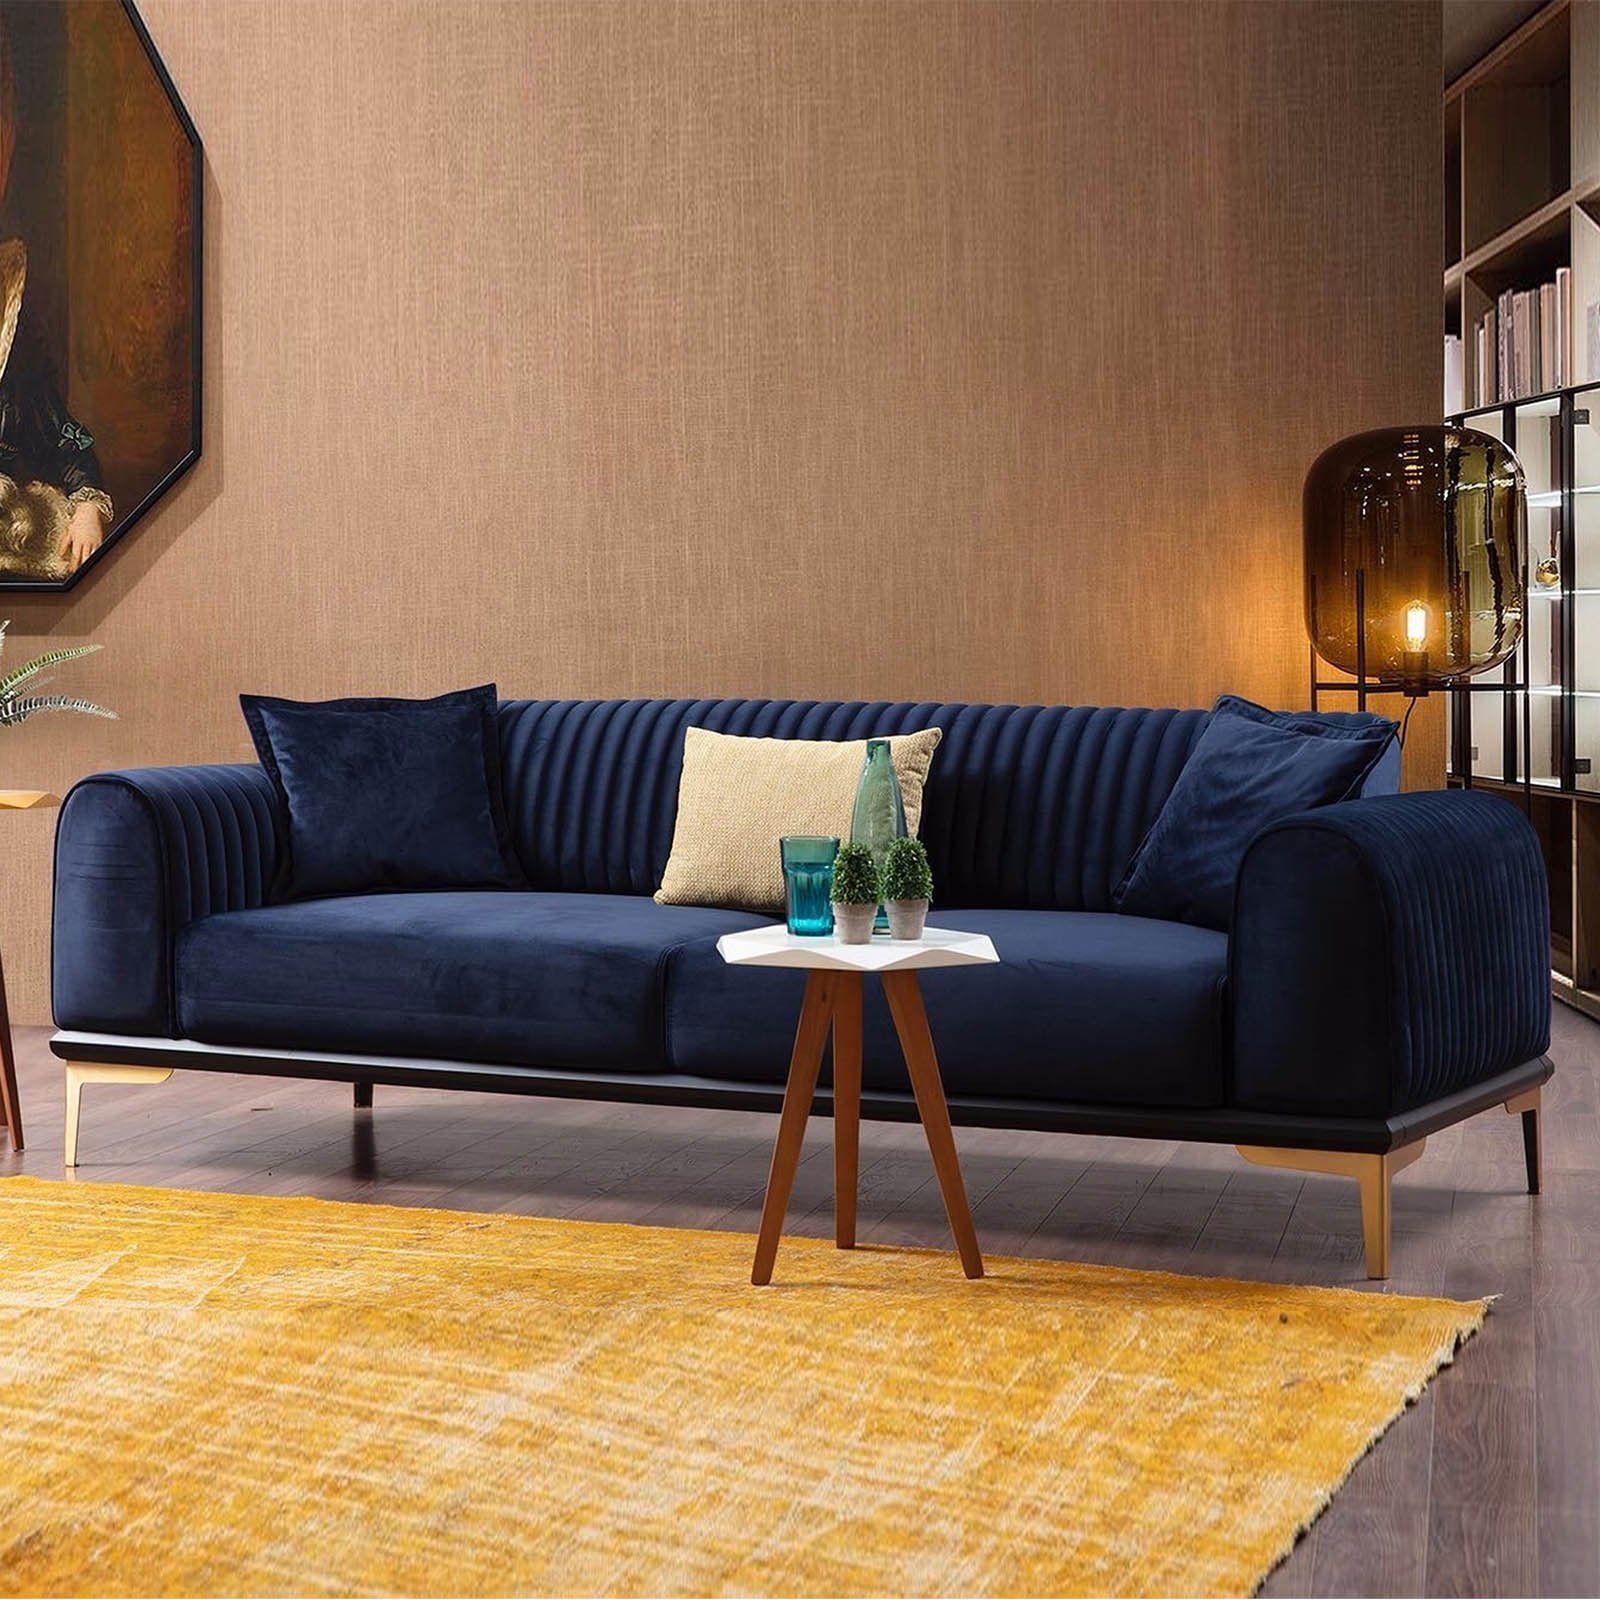 Nirvana 3 Seater Sofa Bed Nirv003 Blue Sofa Bed Design